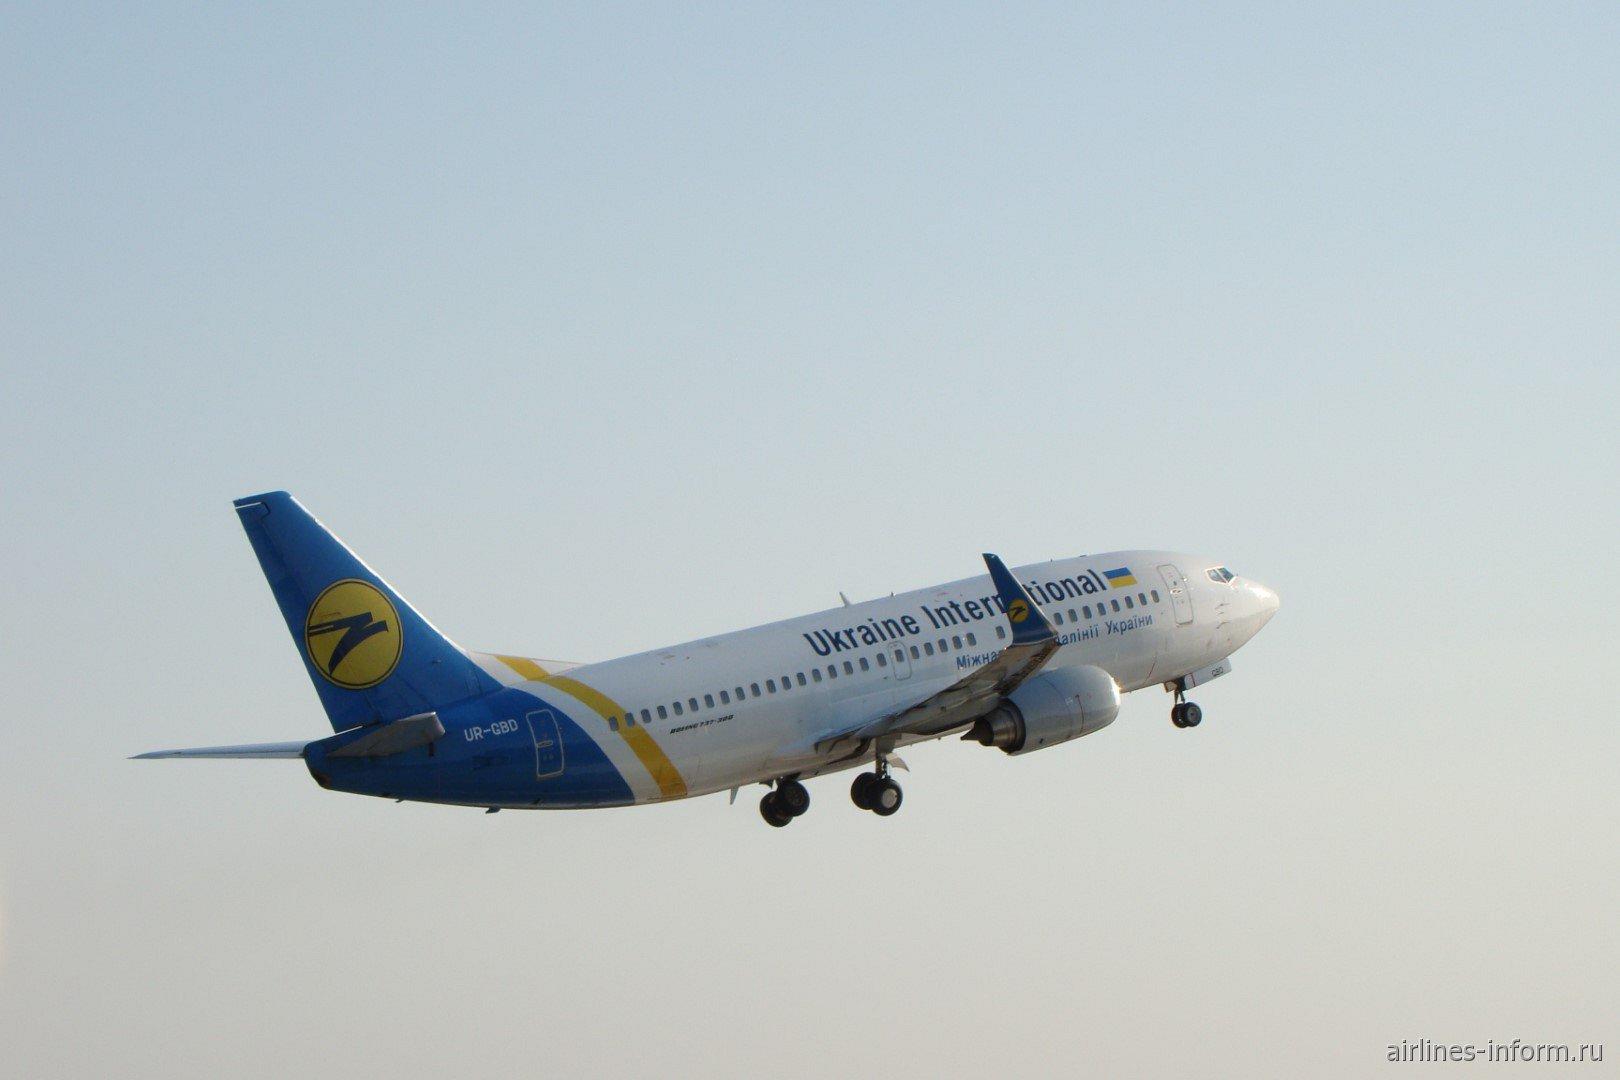 Взлет Боинга-737-300 Международных авиалиний Украины